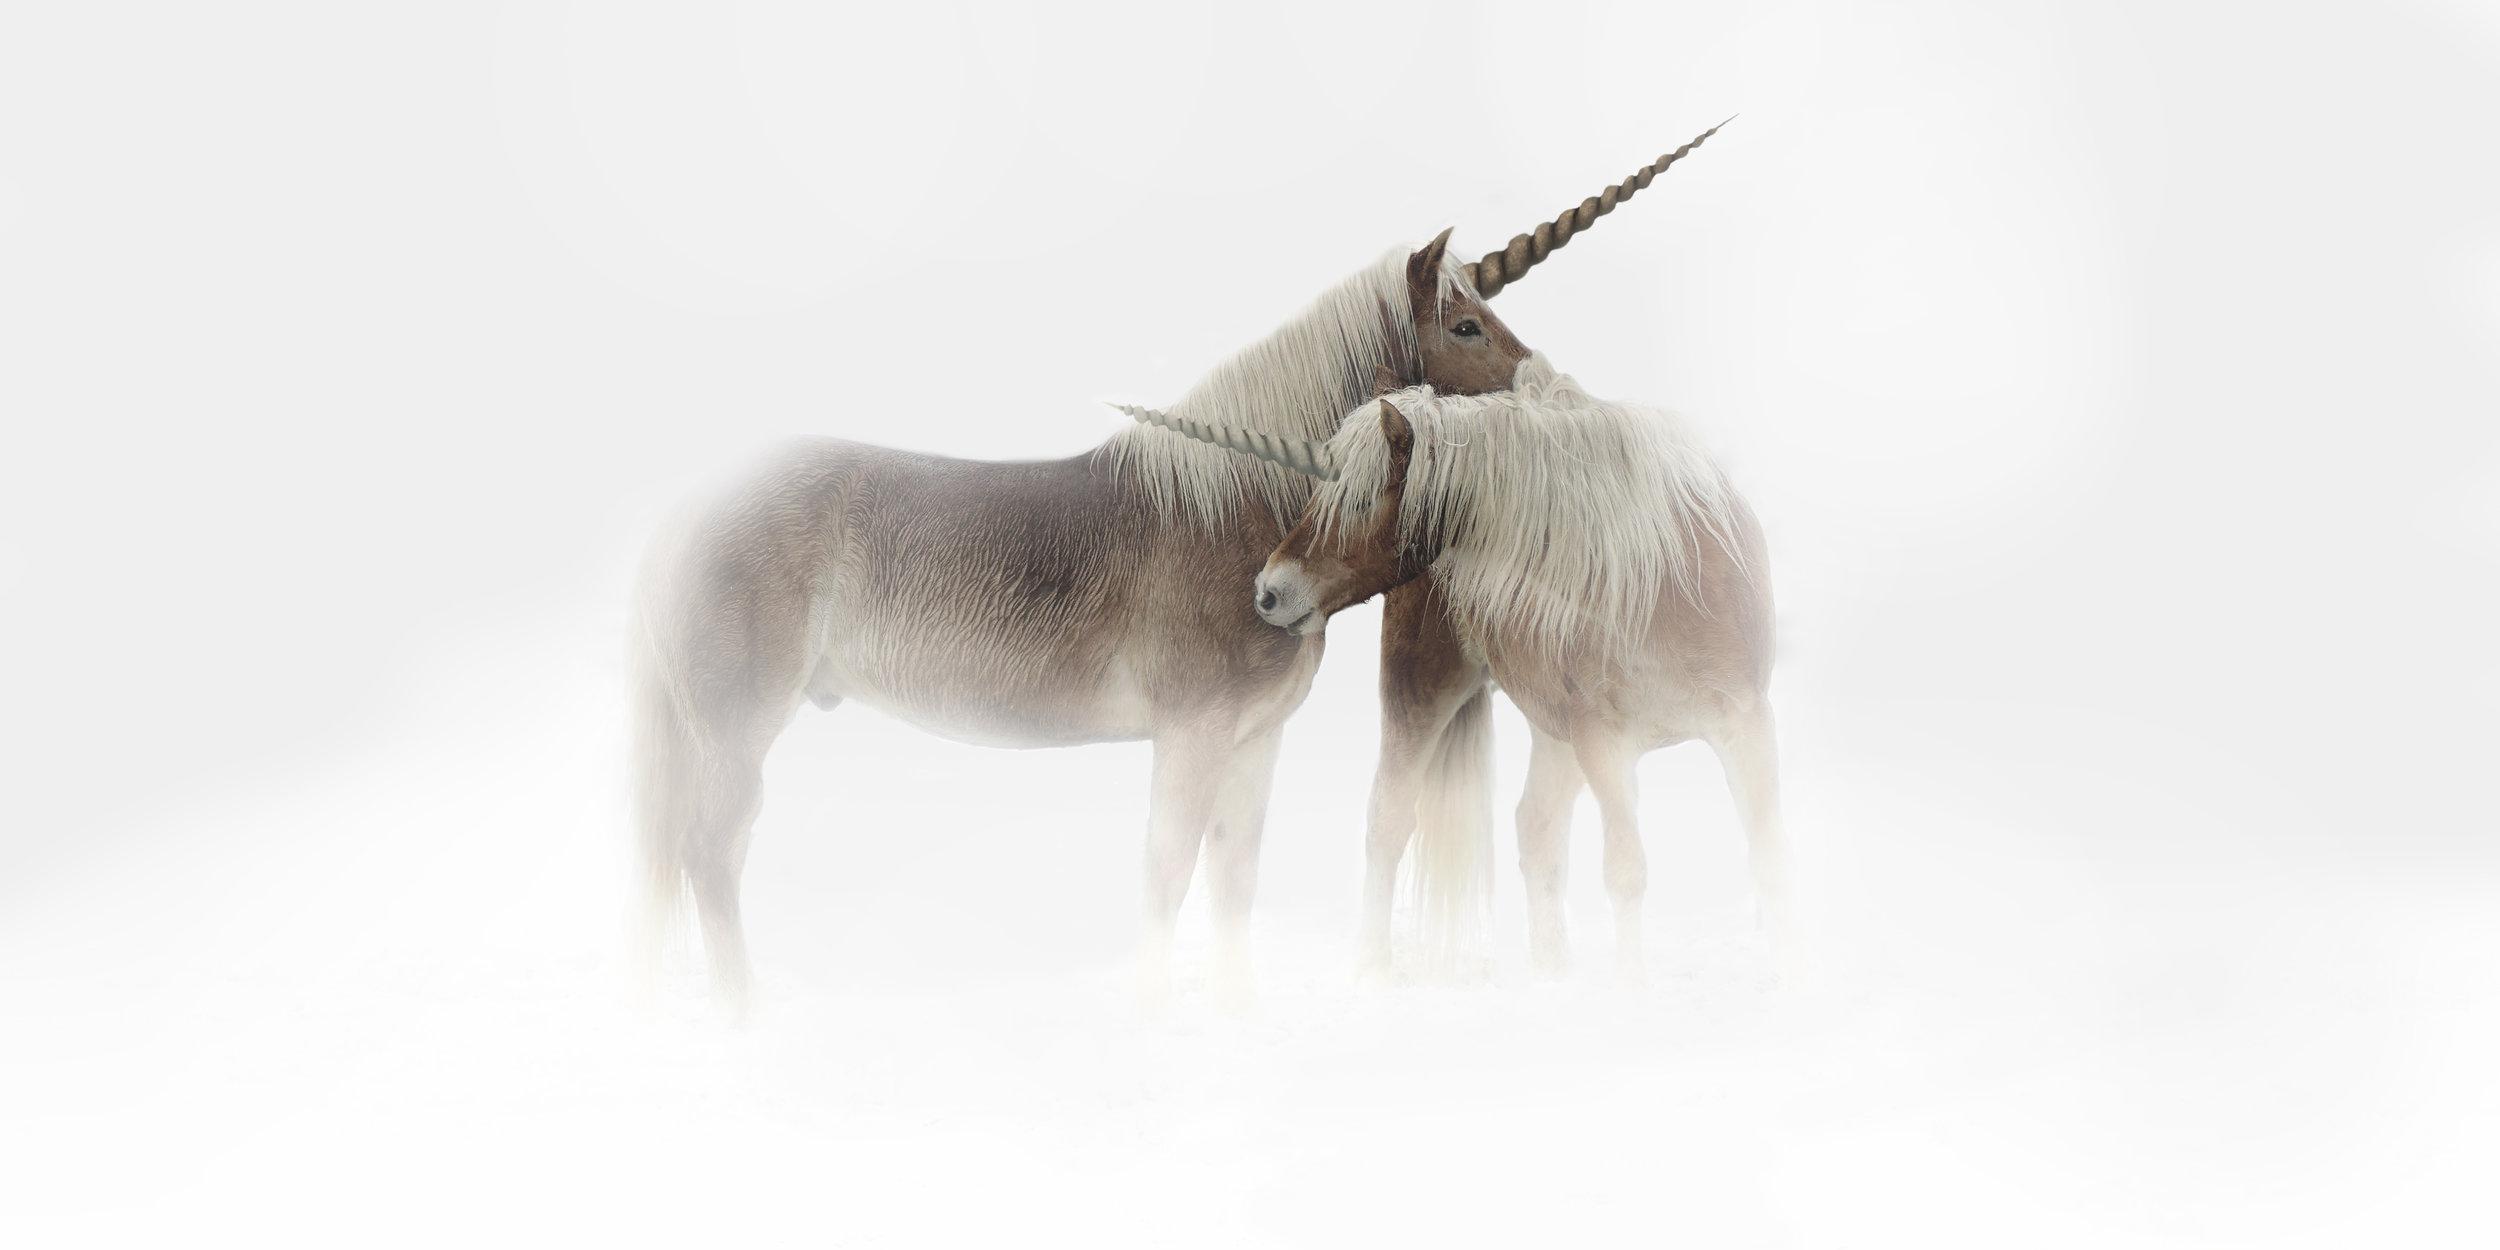 Unicorn: - Myth or Spirit Animal?